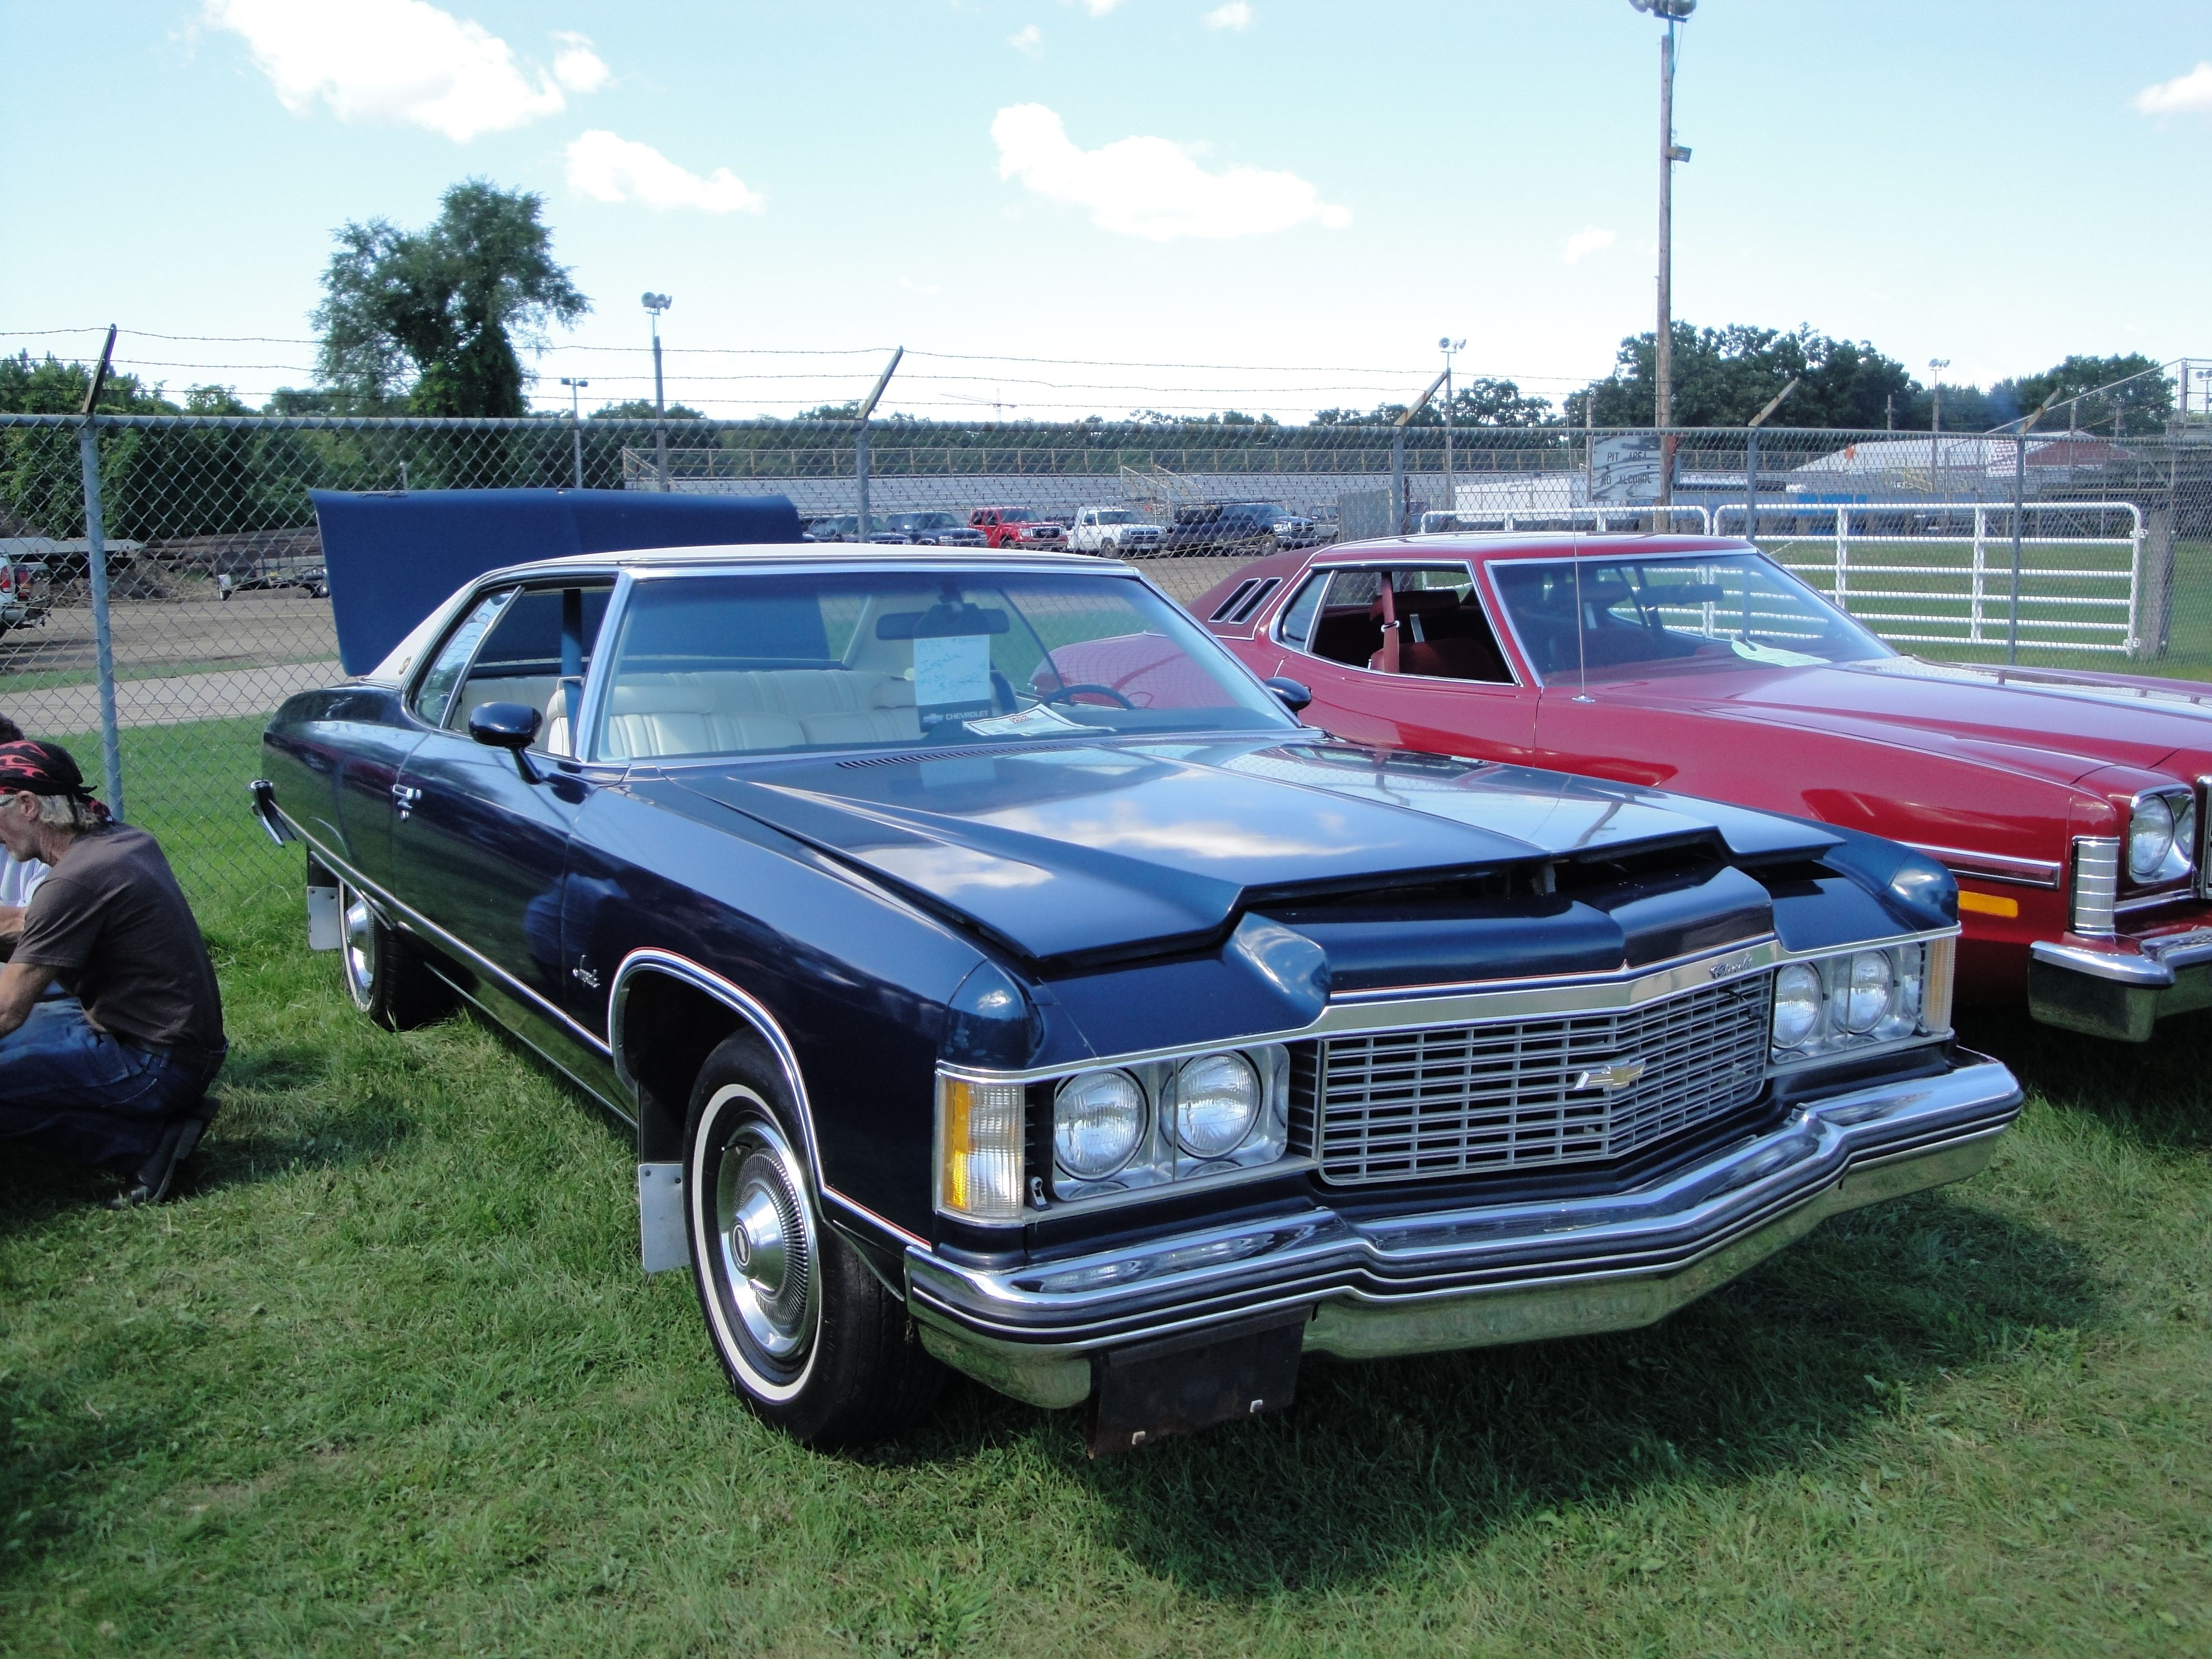 1974 chevrolet impala spirit of america edition  [ 4000 x 3000 Pixel ]